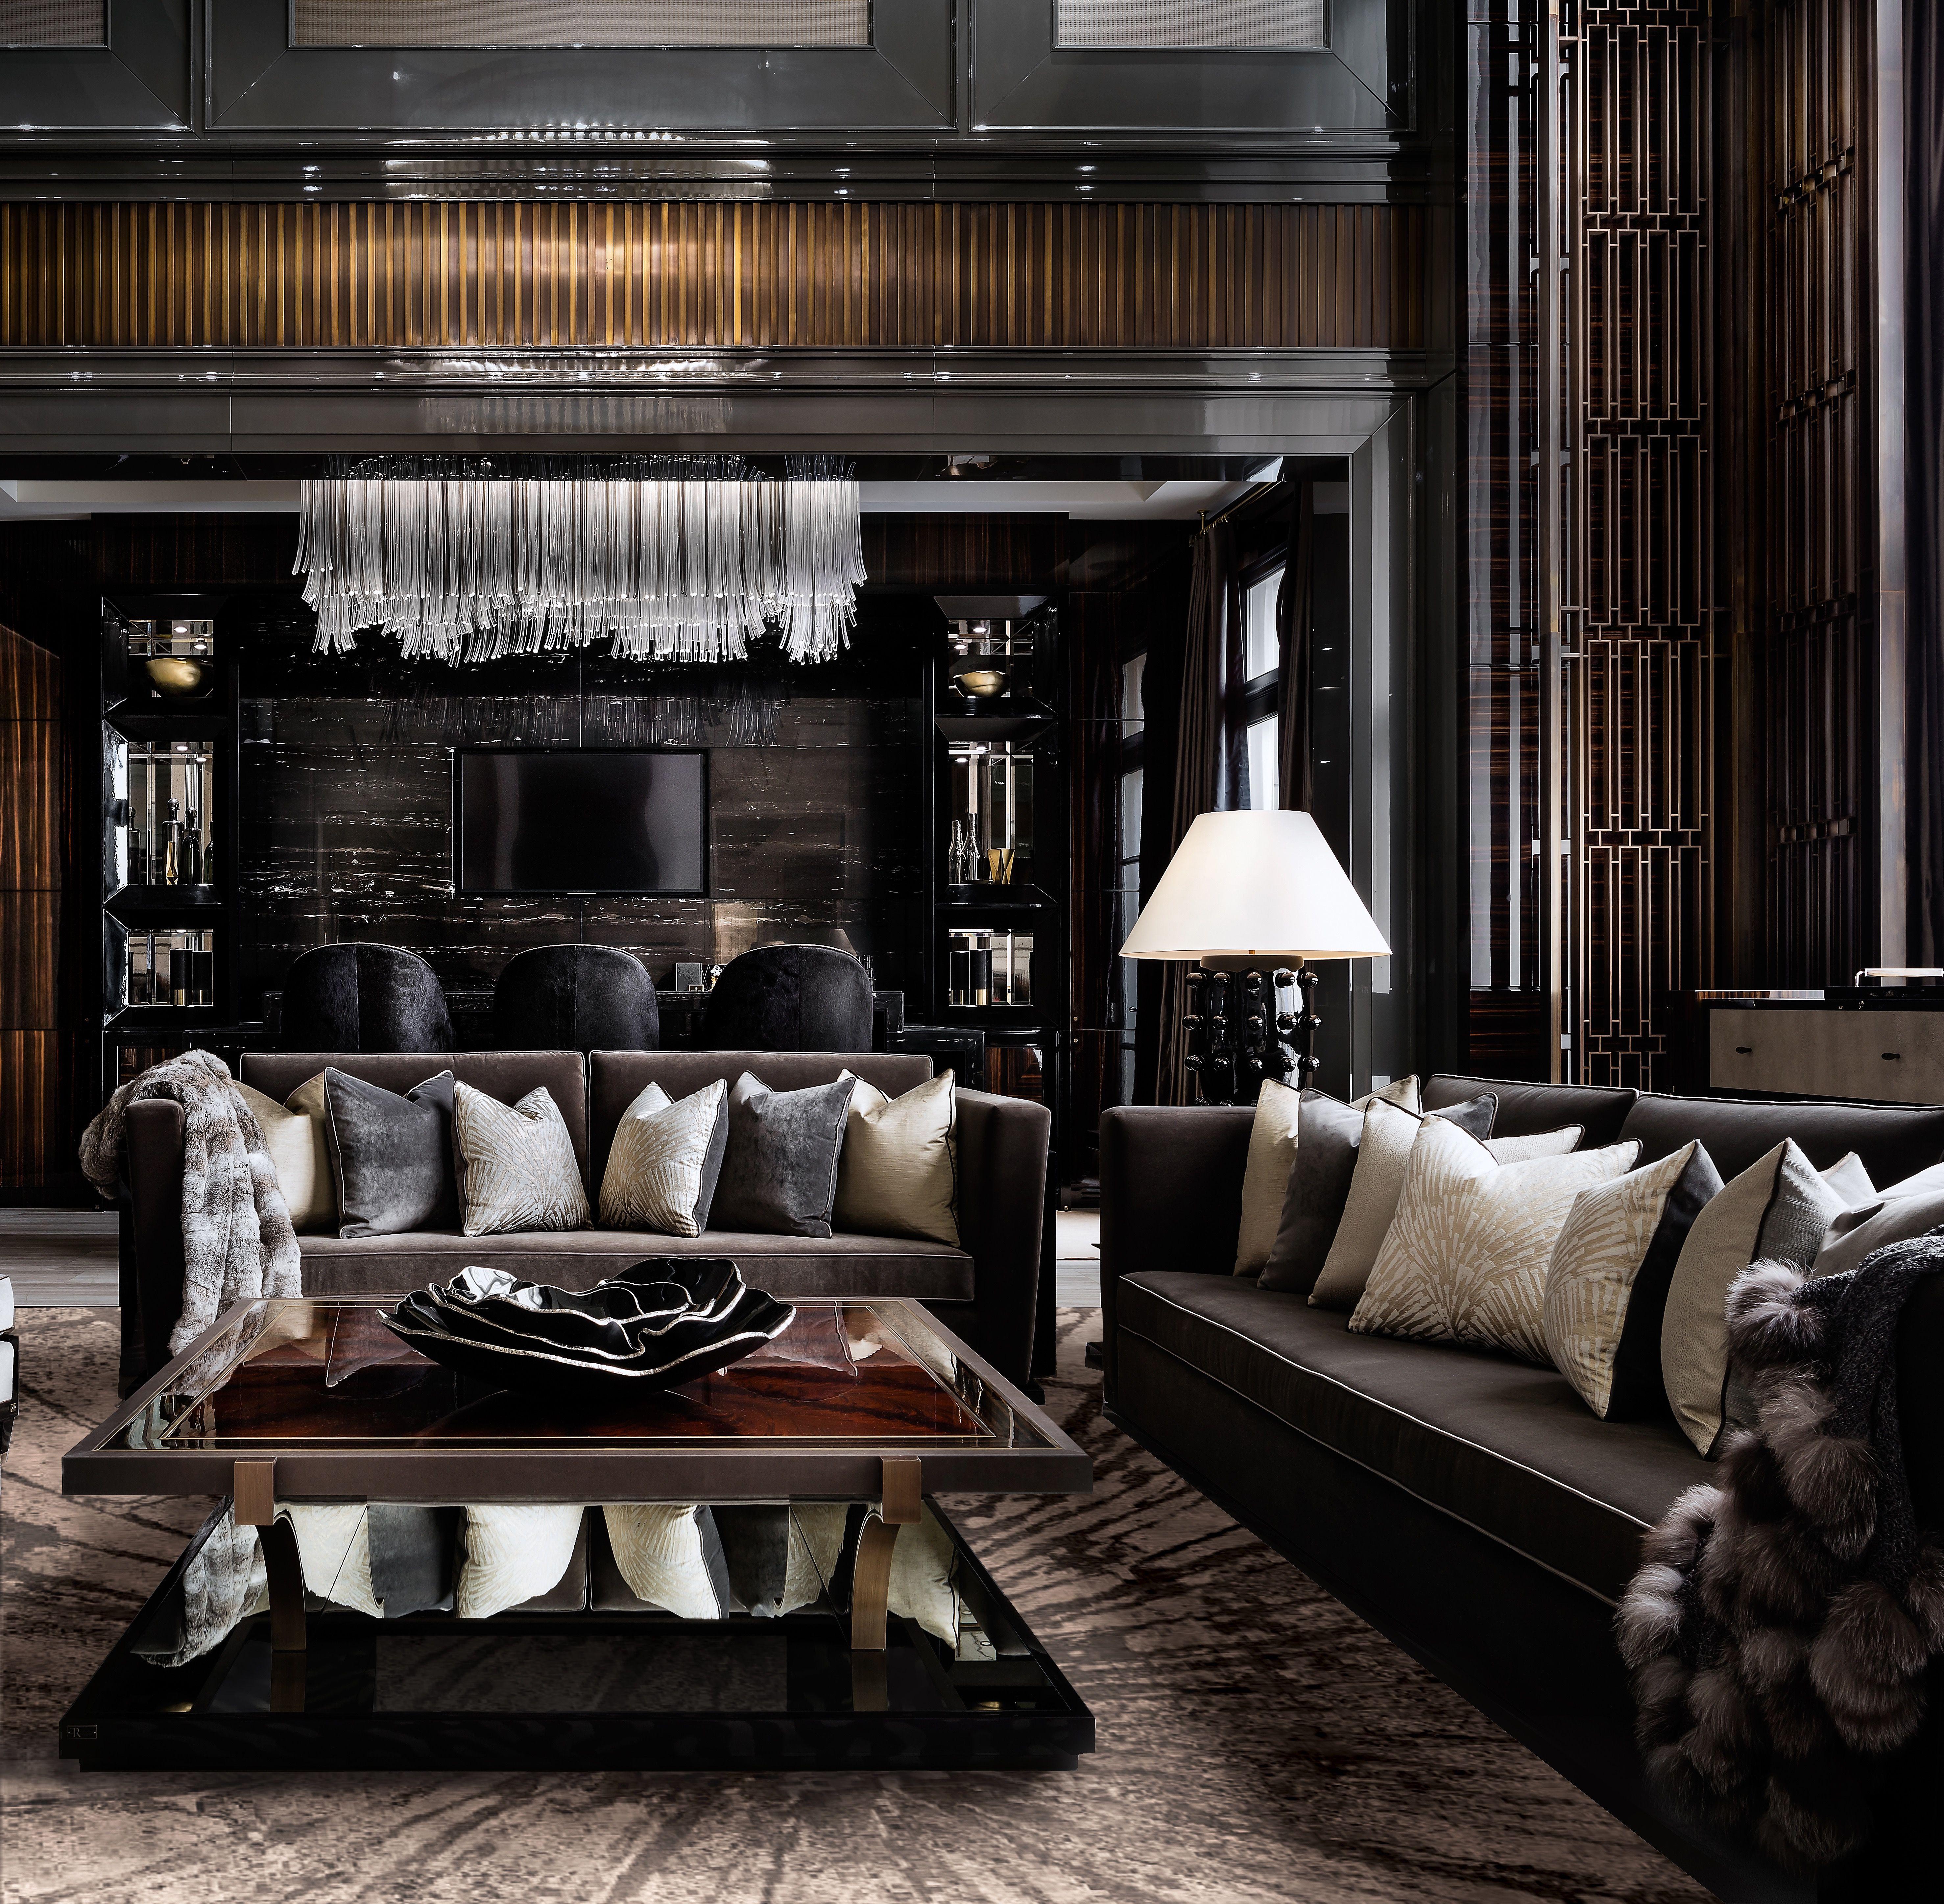 100 Bachelor Pad Living Room Ideas For Men: Architecture By Ferris Rafauli